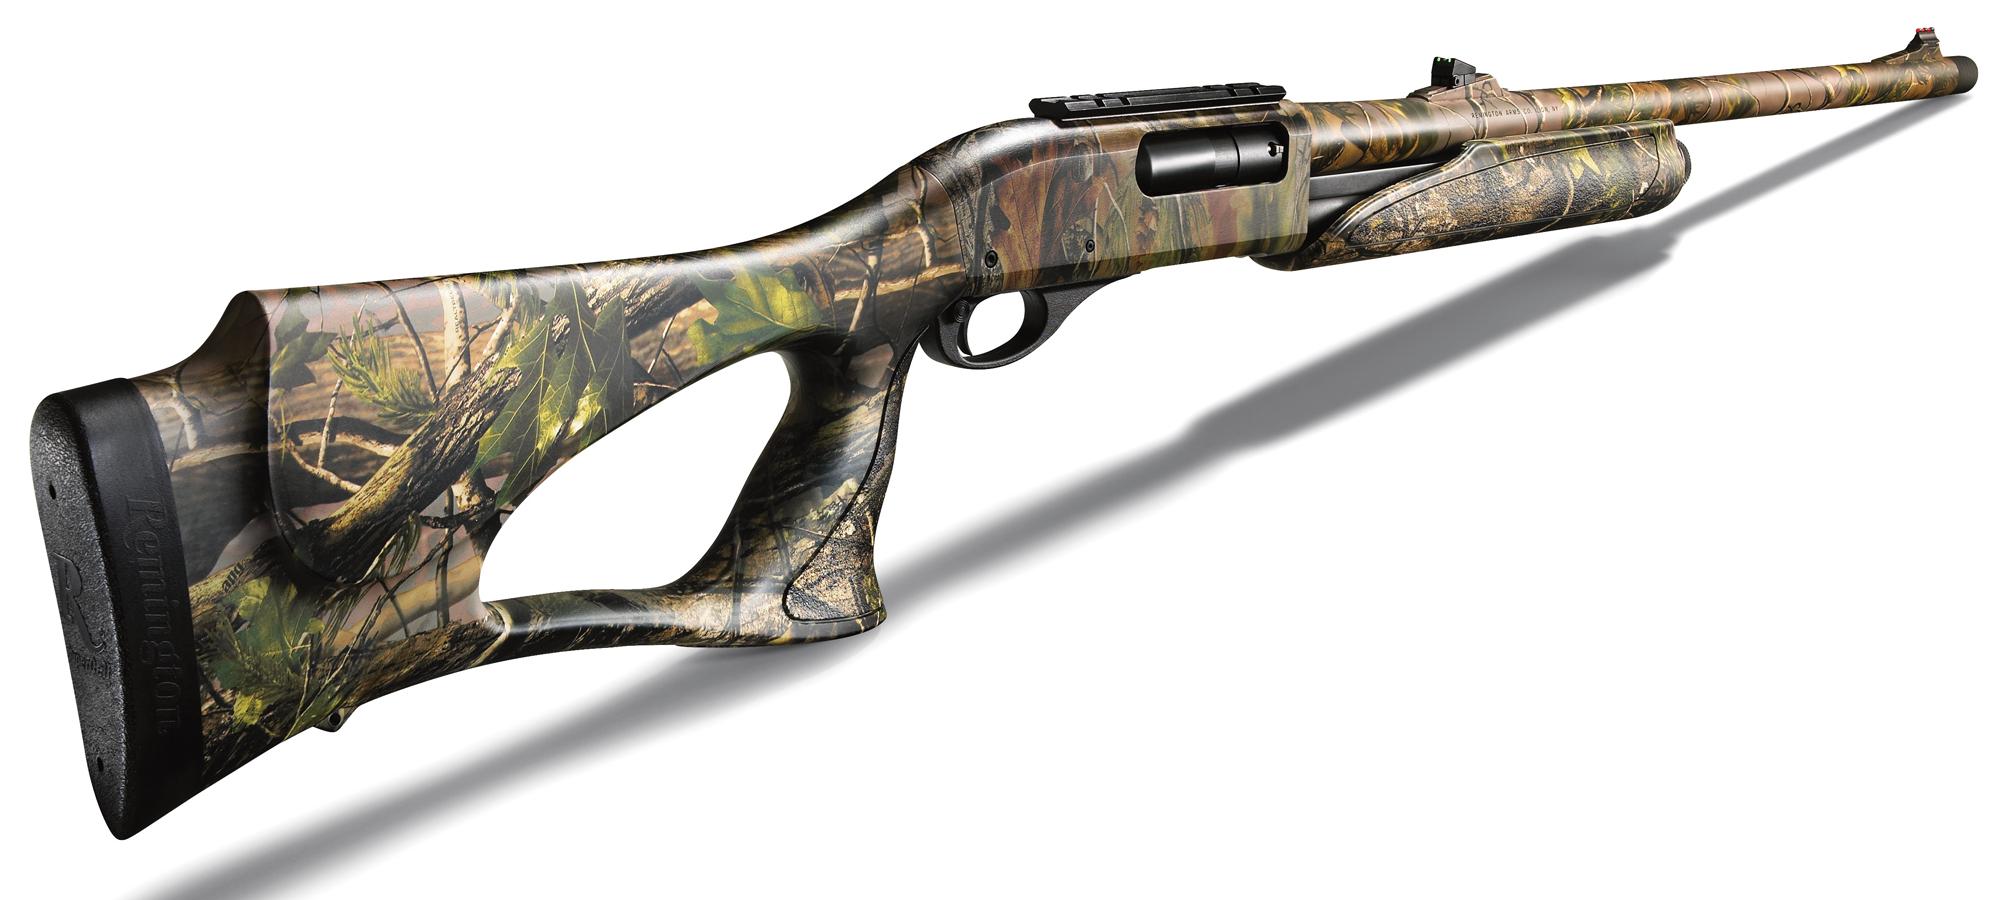 The 10 All-Time Best Turkey Guns | Field & Stream